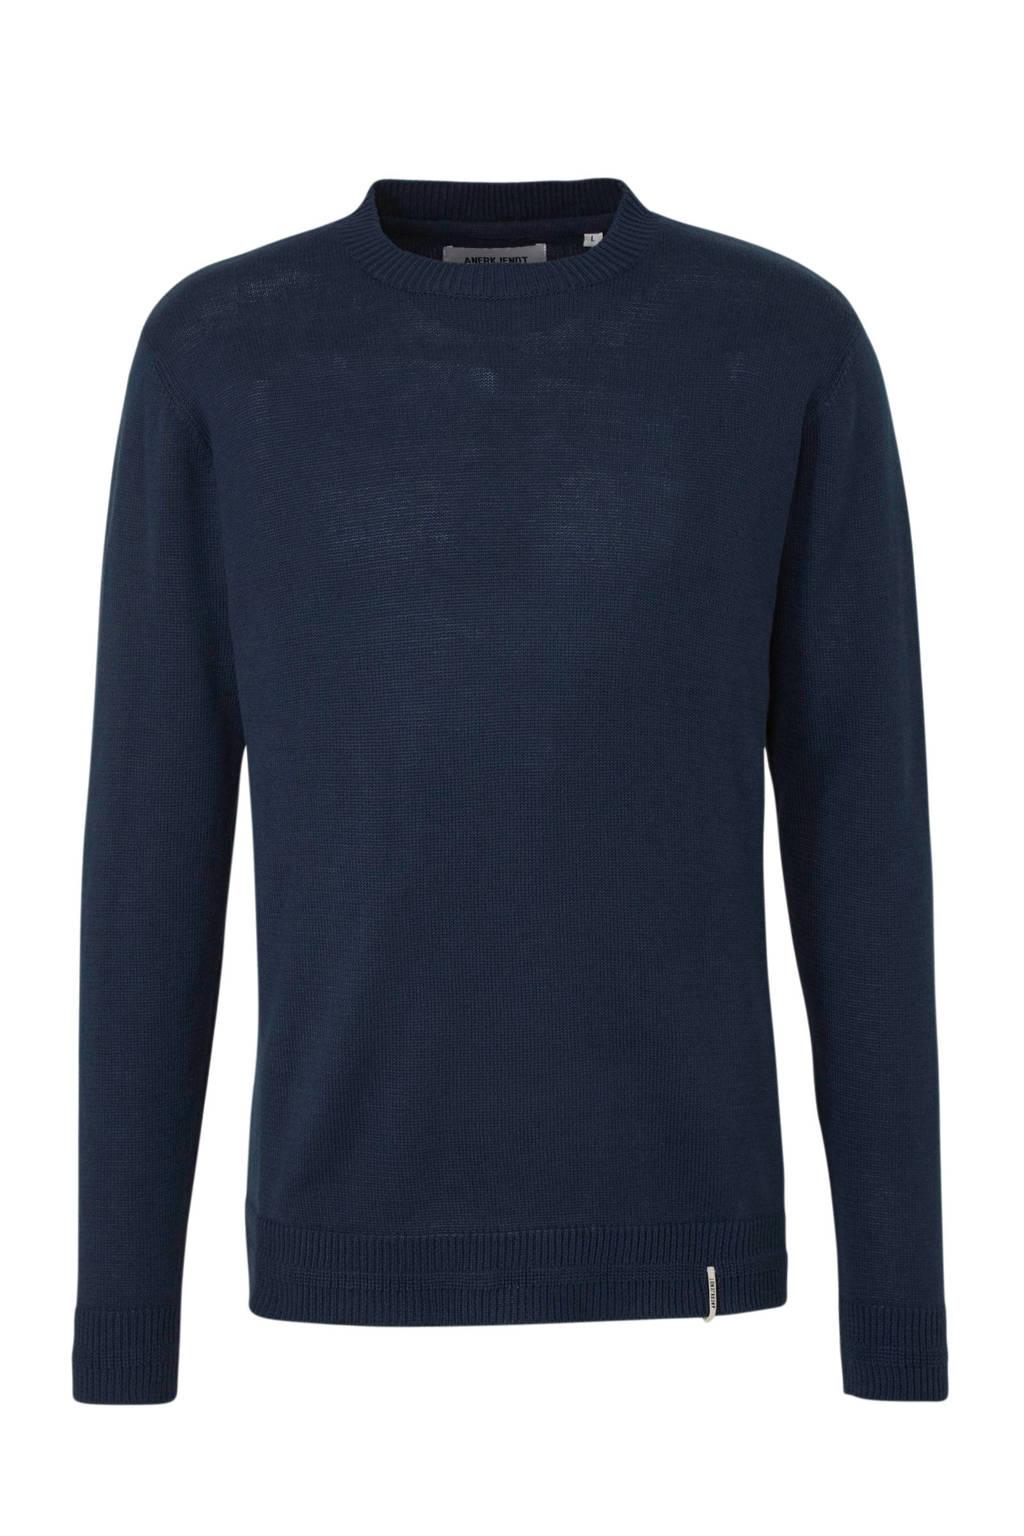 Anerkjendt sweater donkerblauw, Donkerblauw